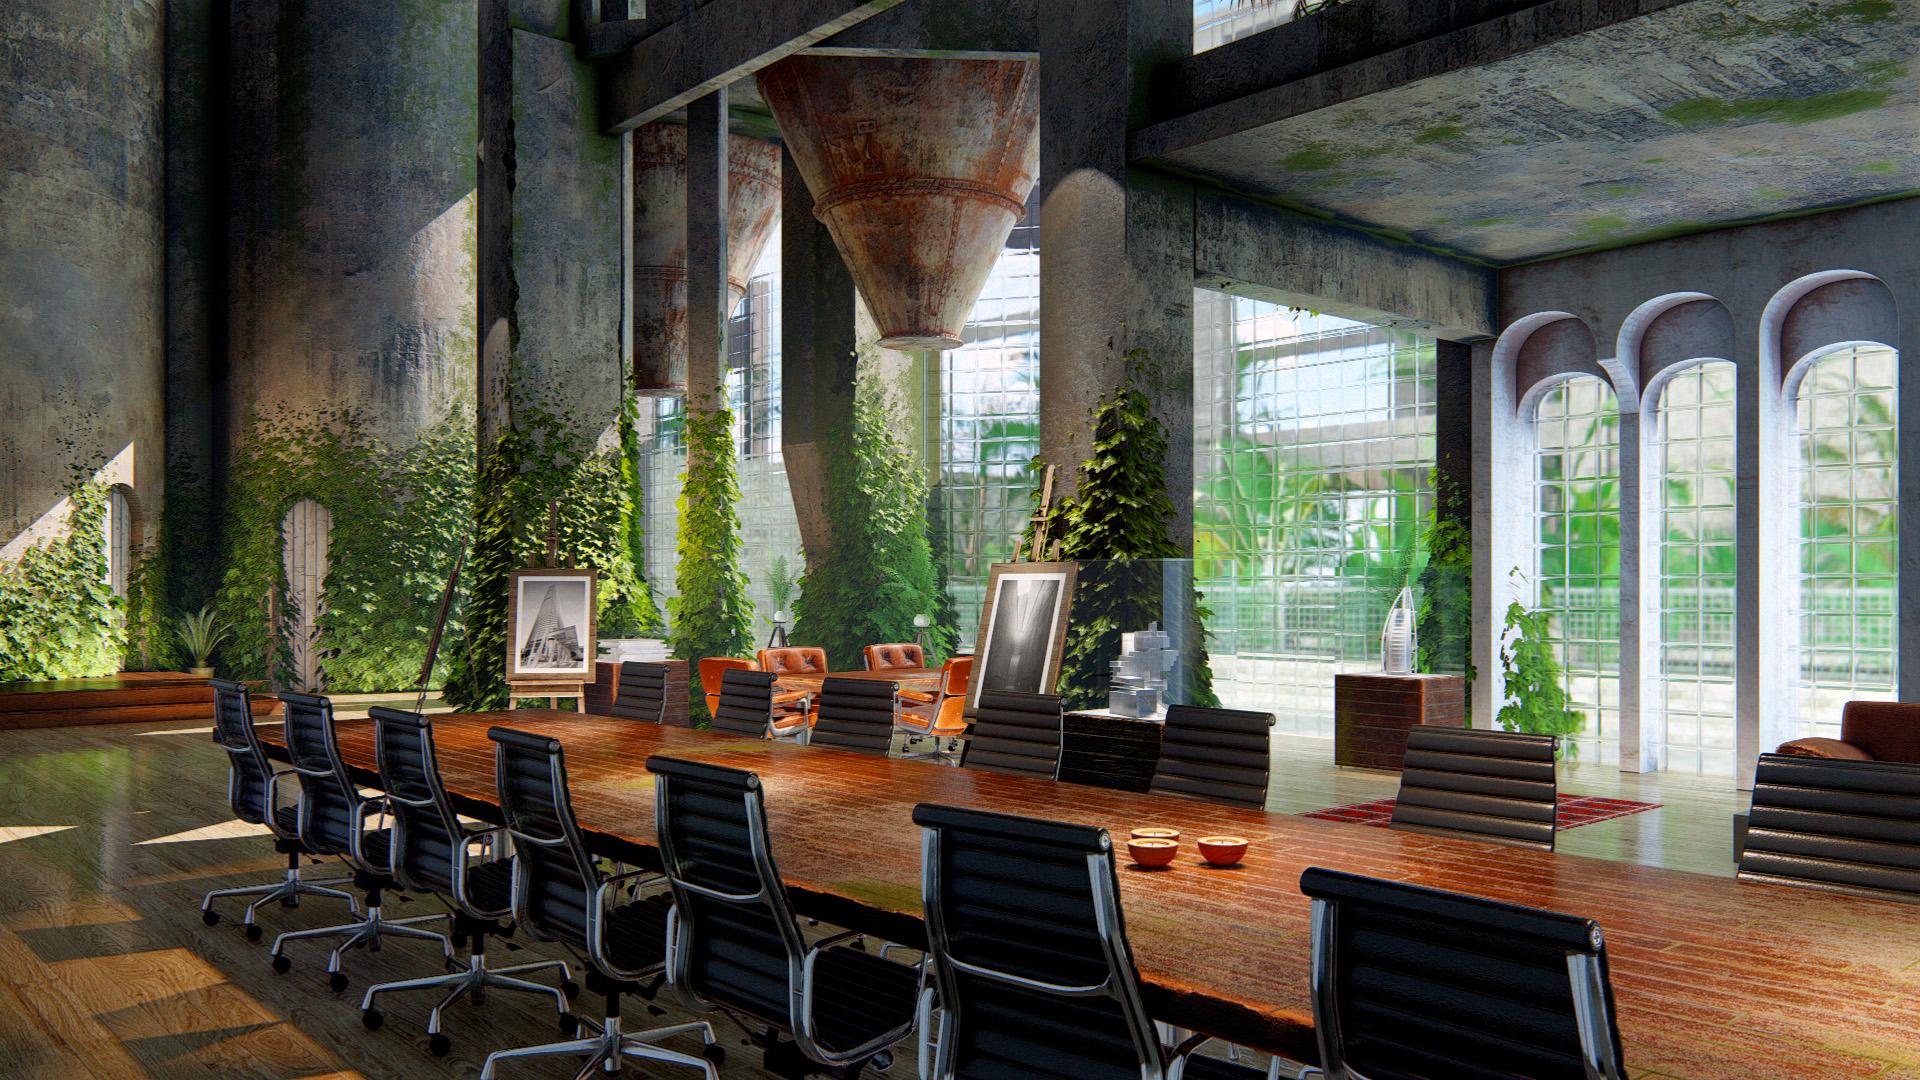 Revit 2017 rendering engine autodesk community for Revit architecture modern house design 8